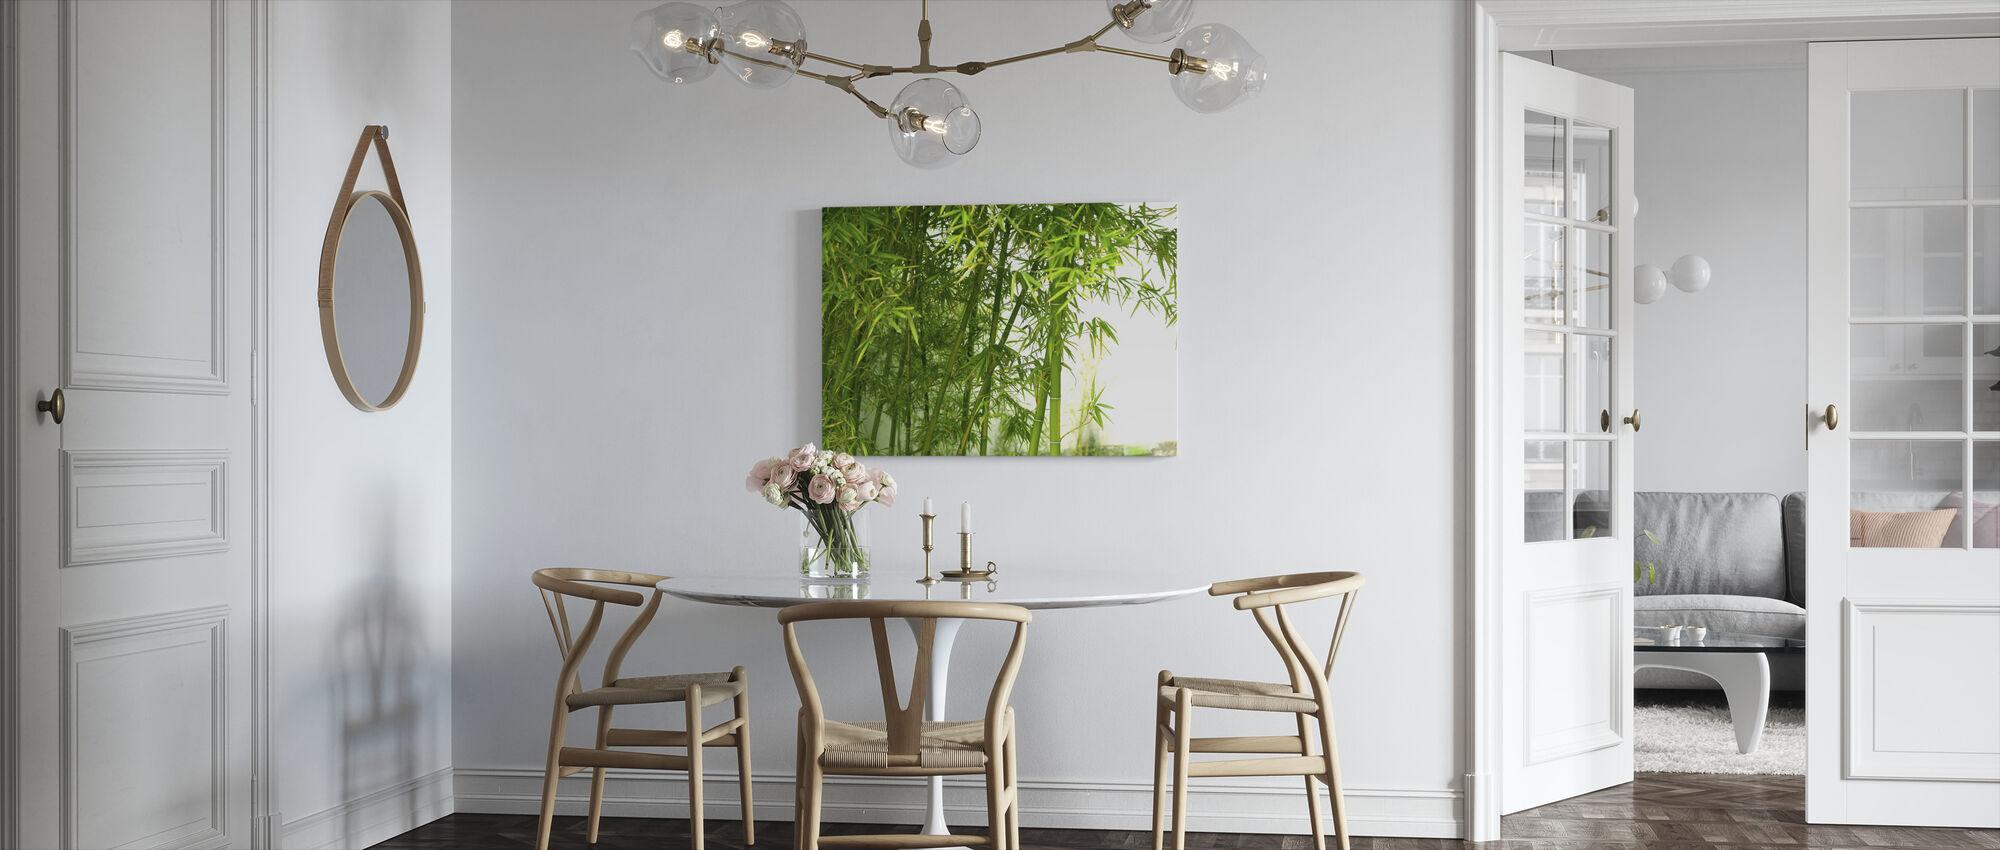 Mooie Bamboe - Canvas print - Keuken